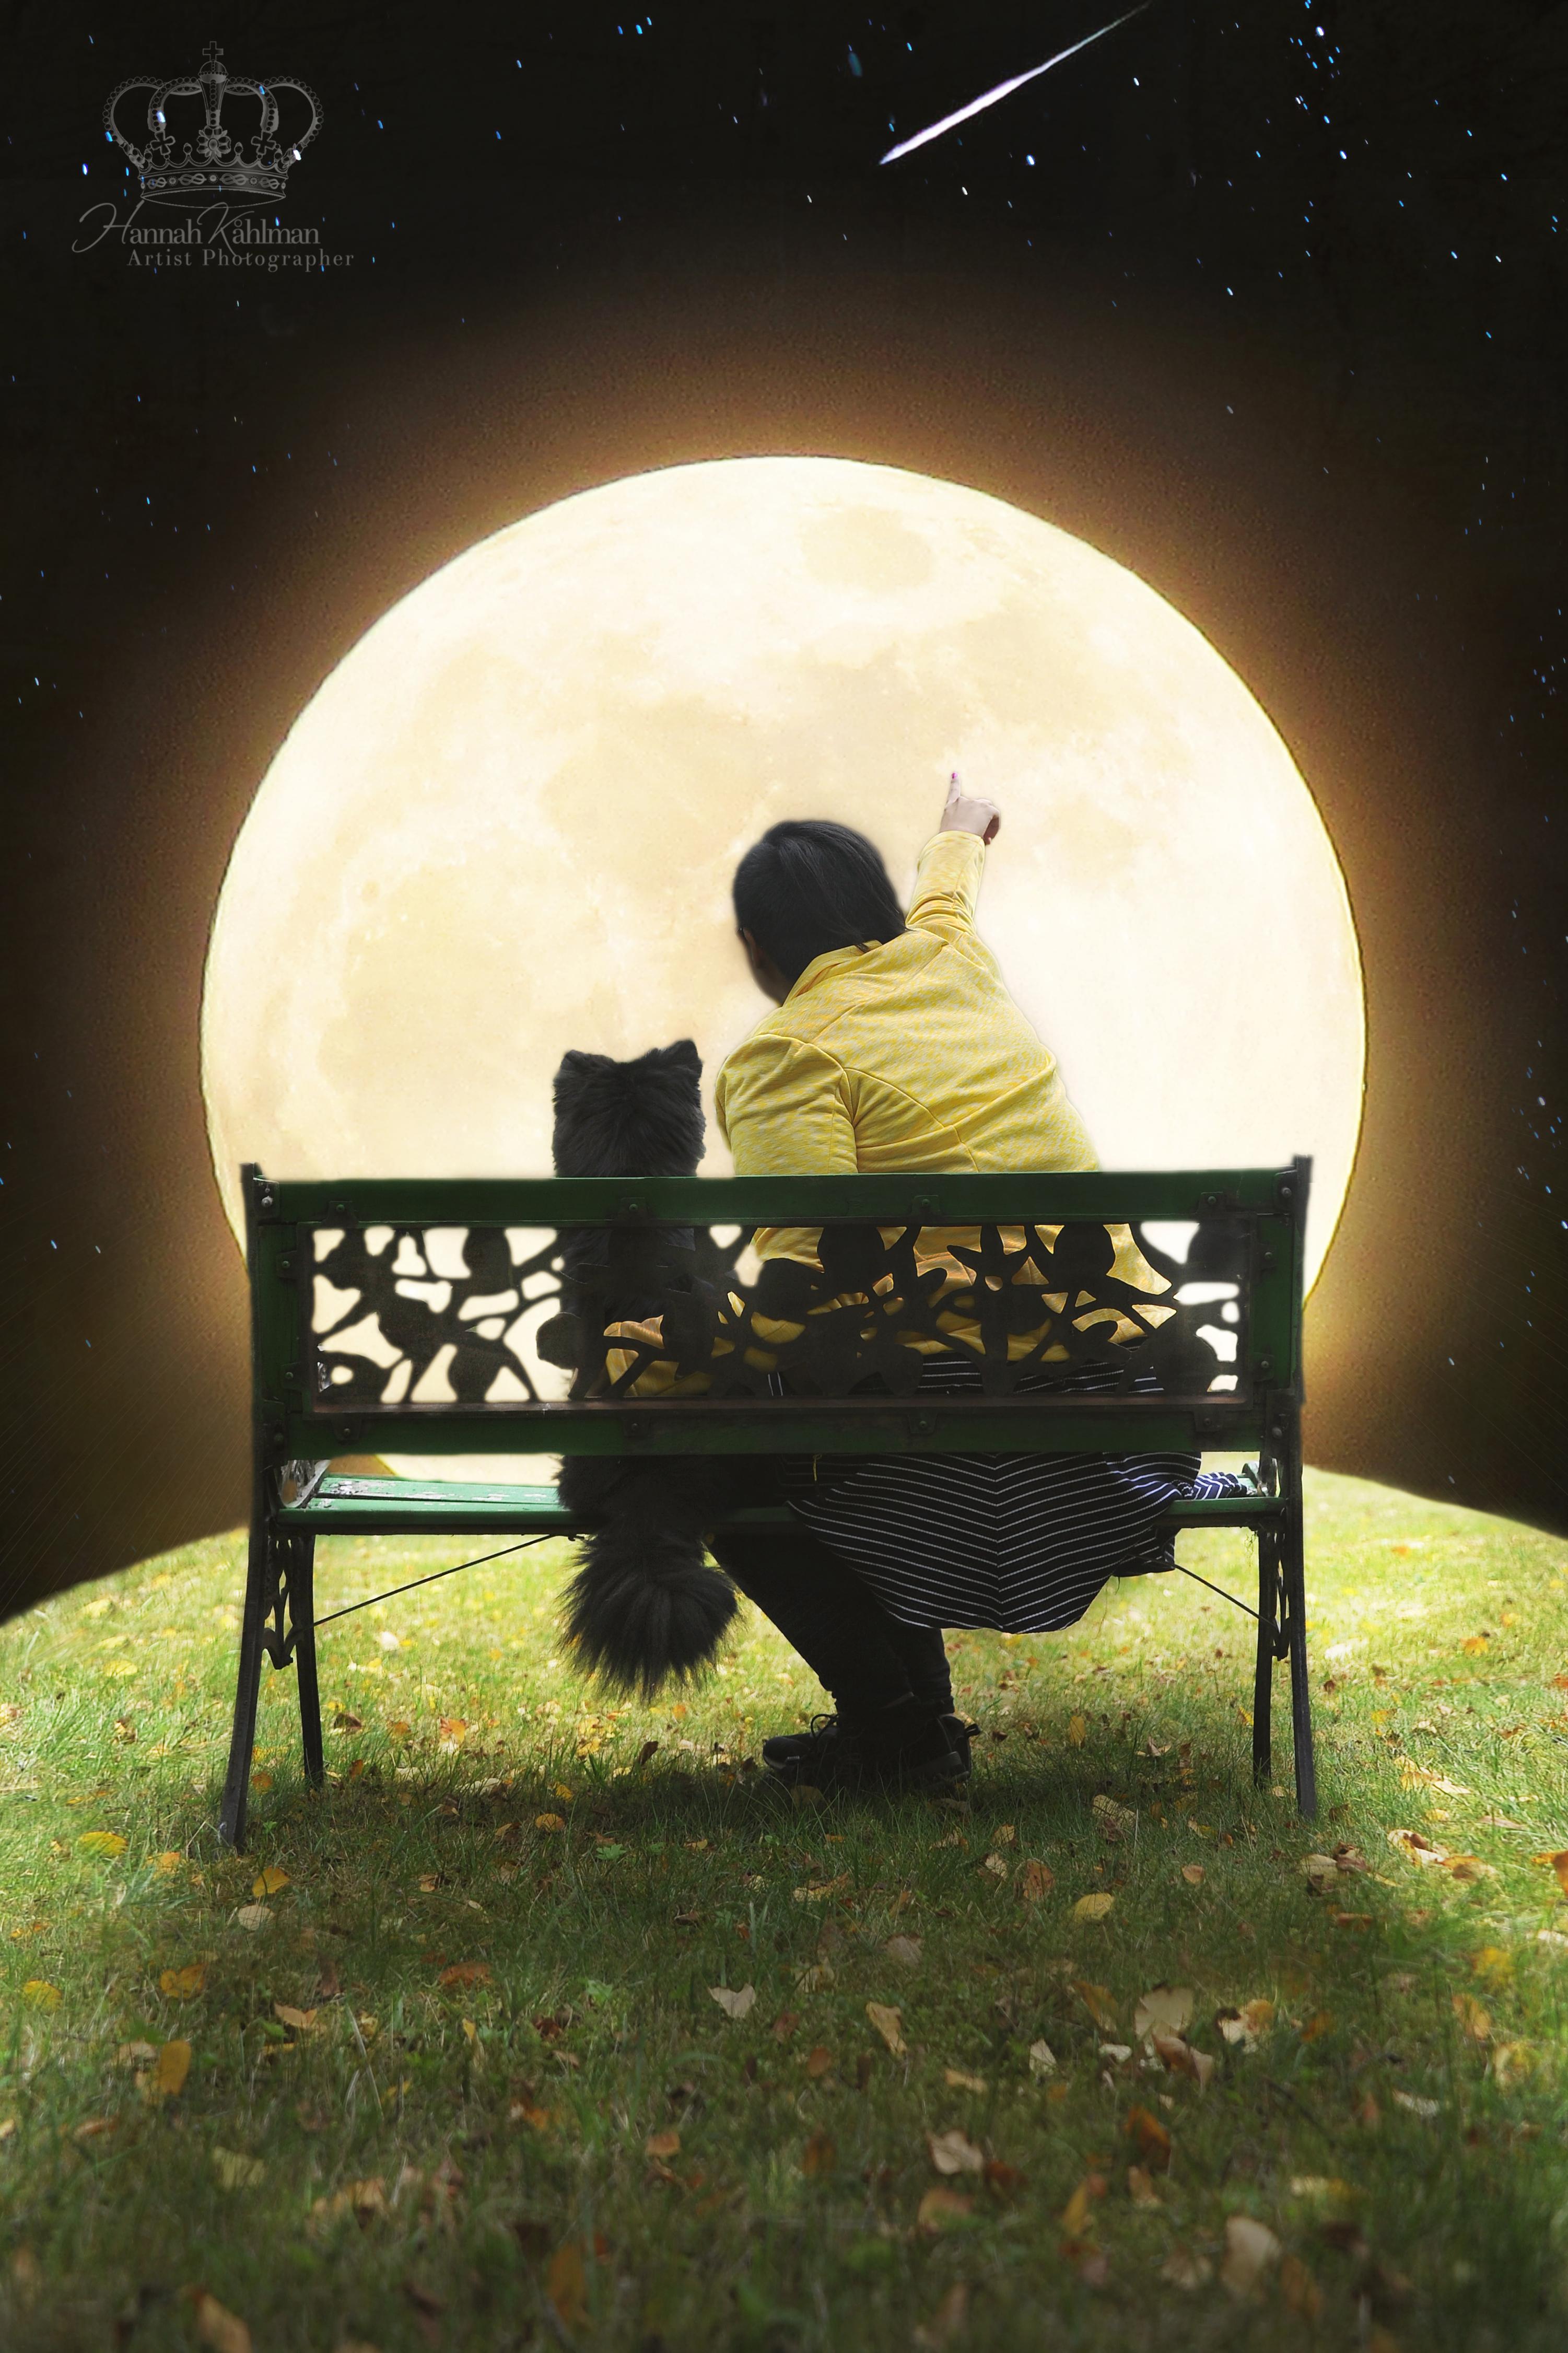 Woman_and_dog_portrait_conceptual_moon_p